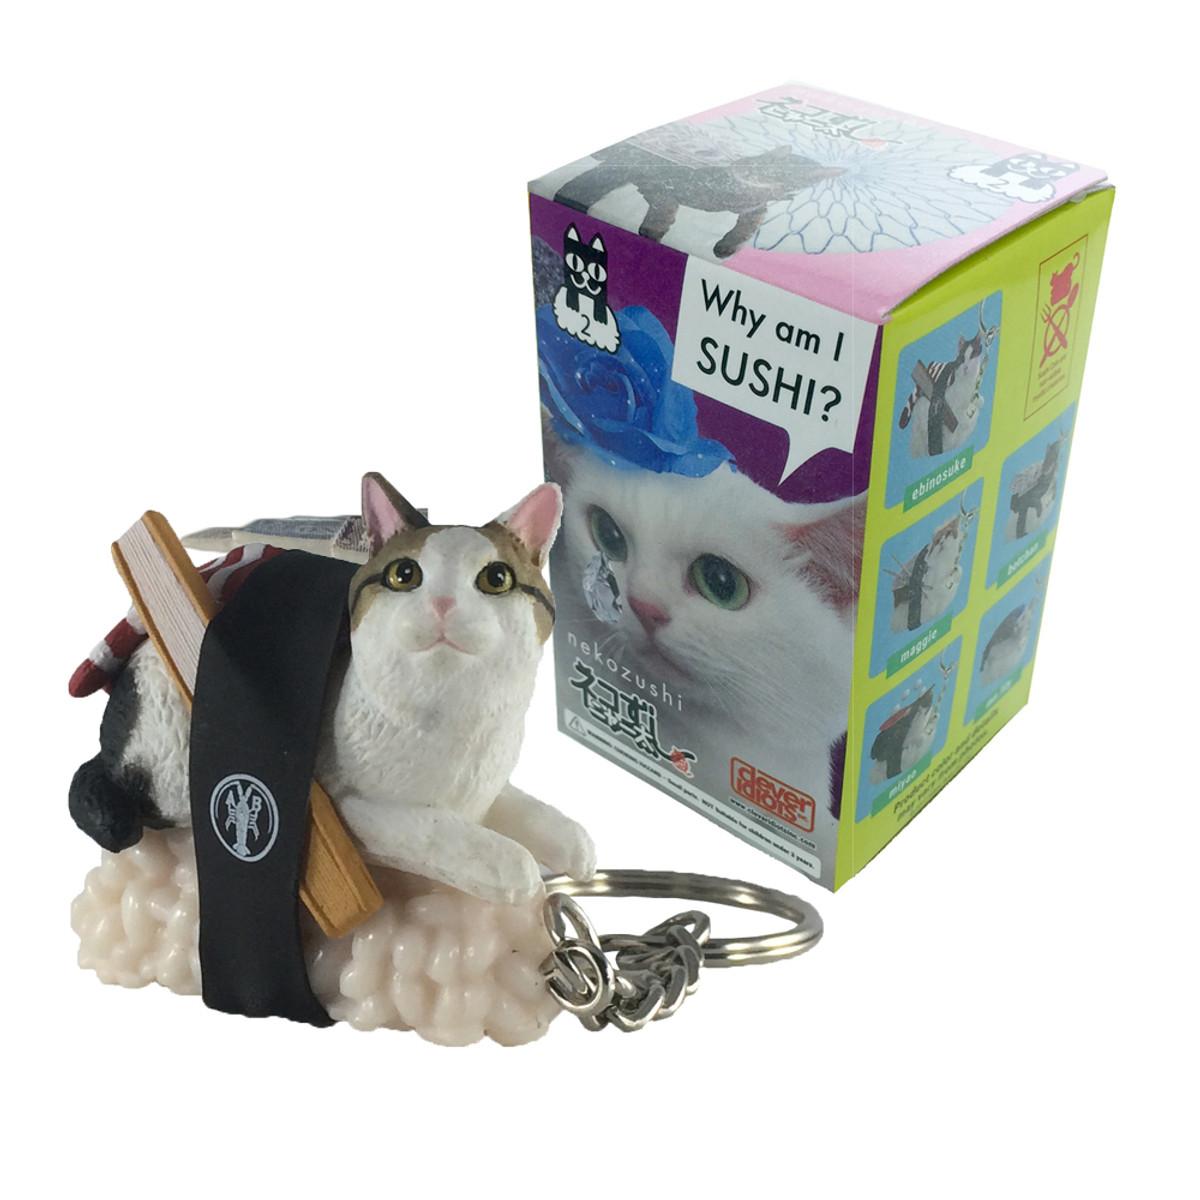 Nekozushi Sushi Cat Series 2 Blind Box Myplasticheart